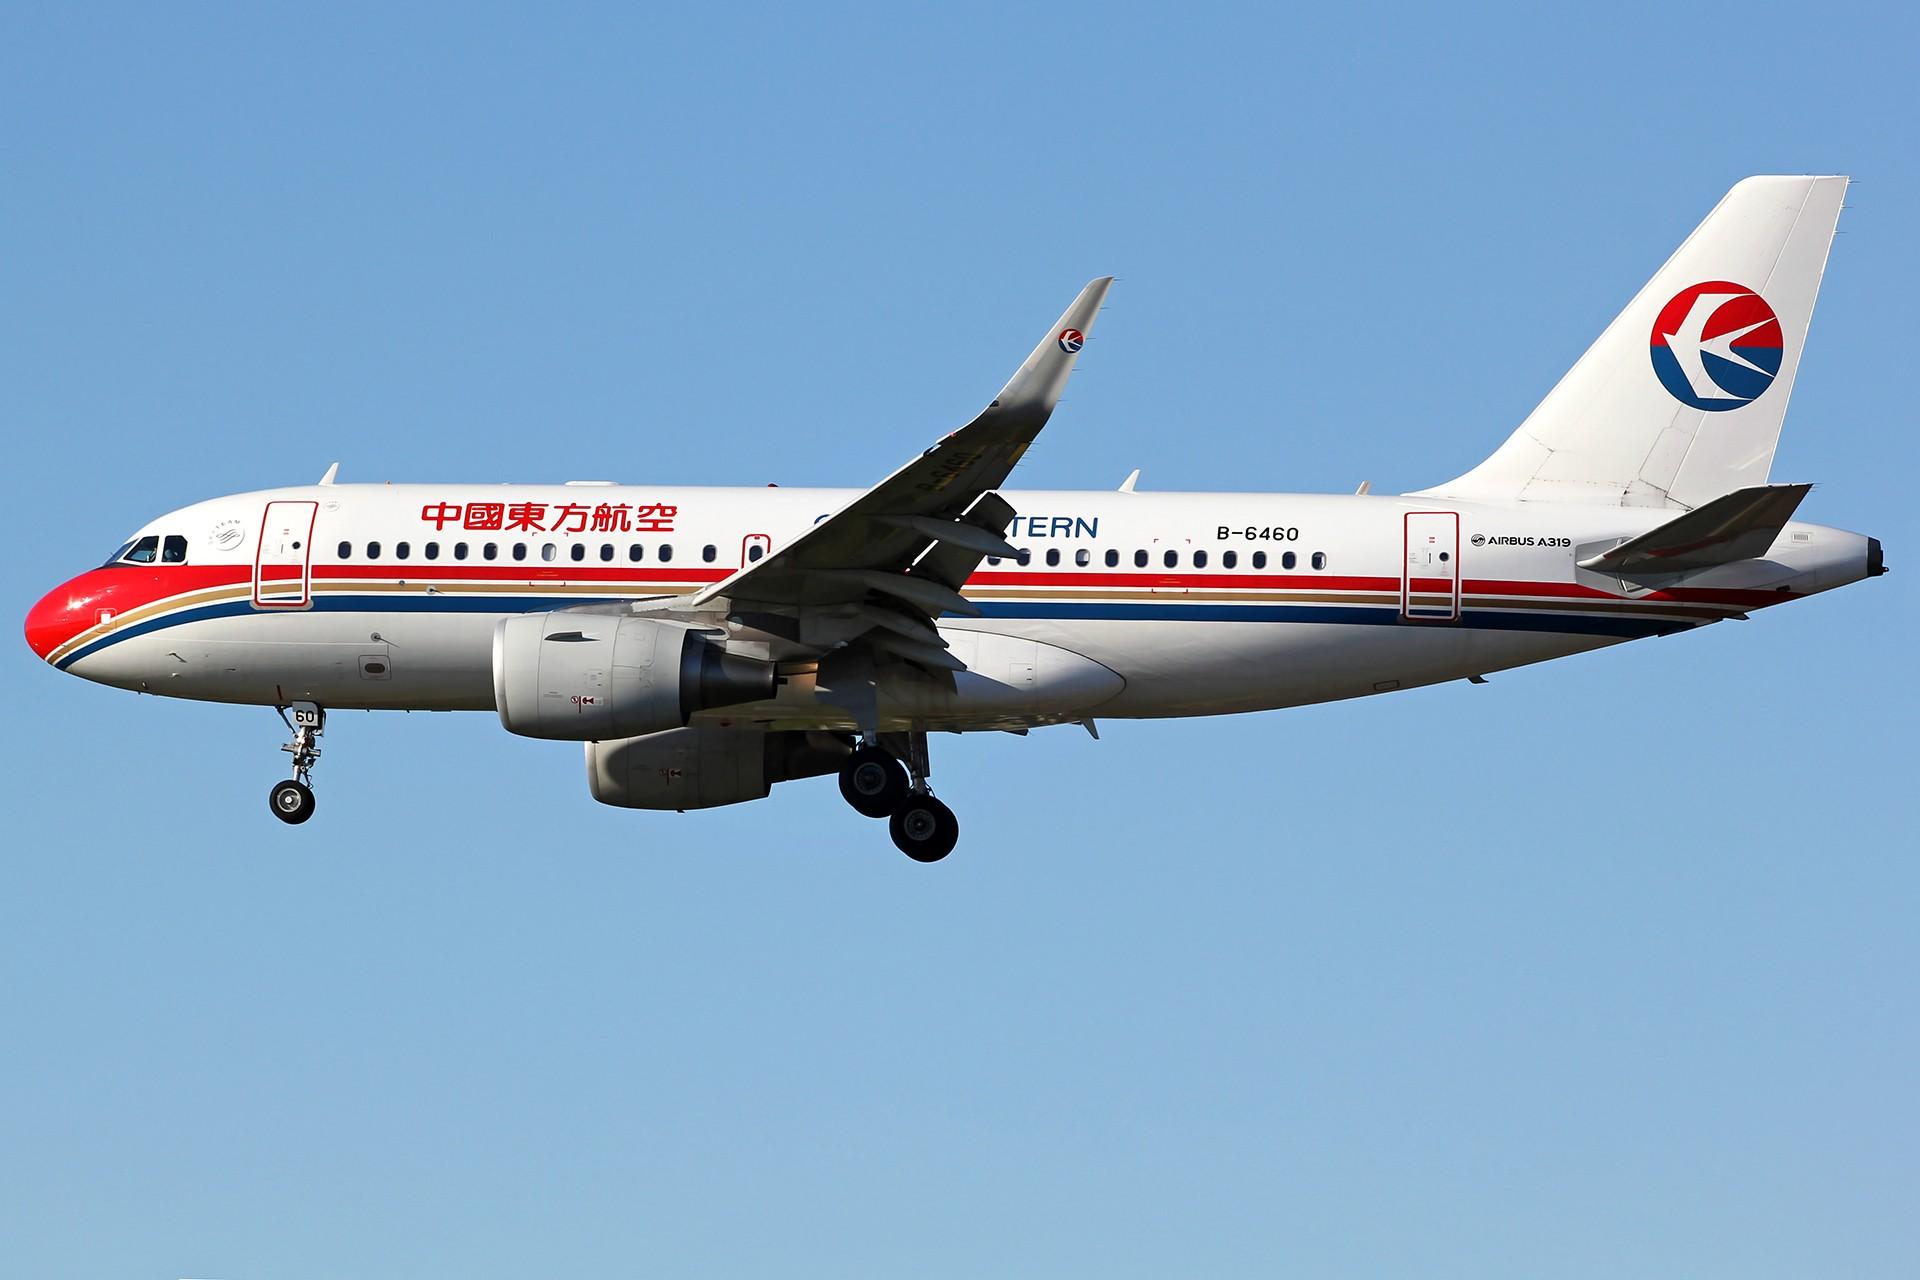 Re:[原创][DLC]。。。降落一组。。。 AIRBUS A319-100 B-6460 中国大连国际机场